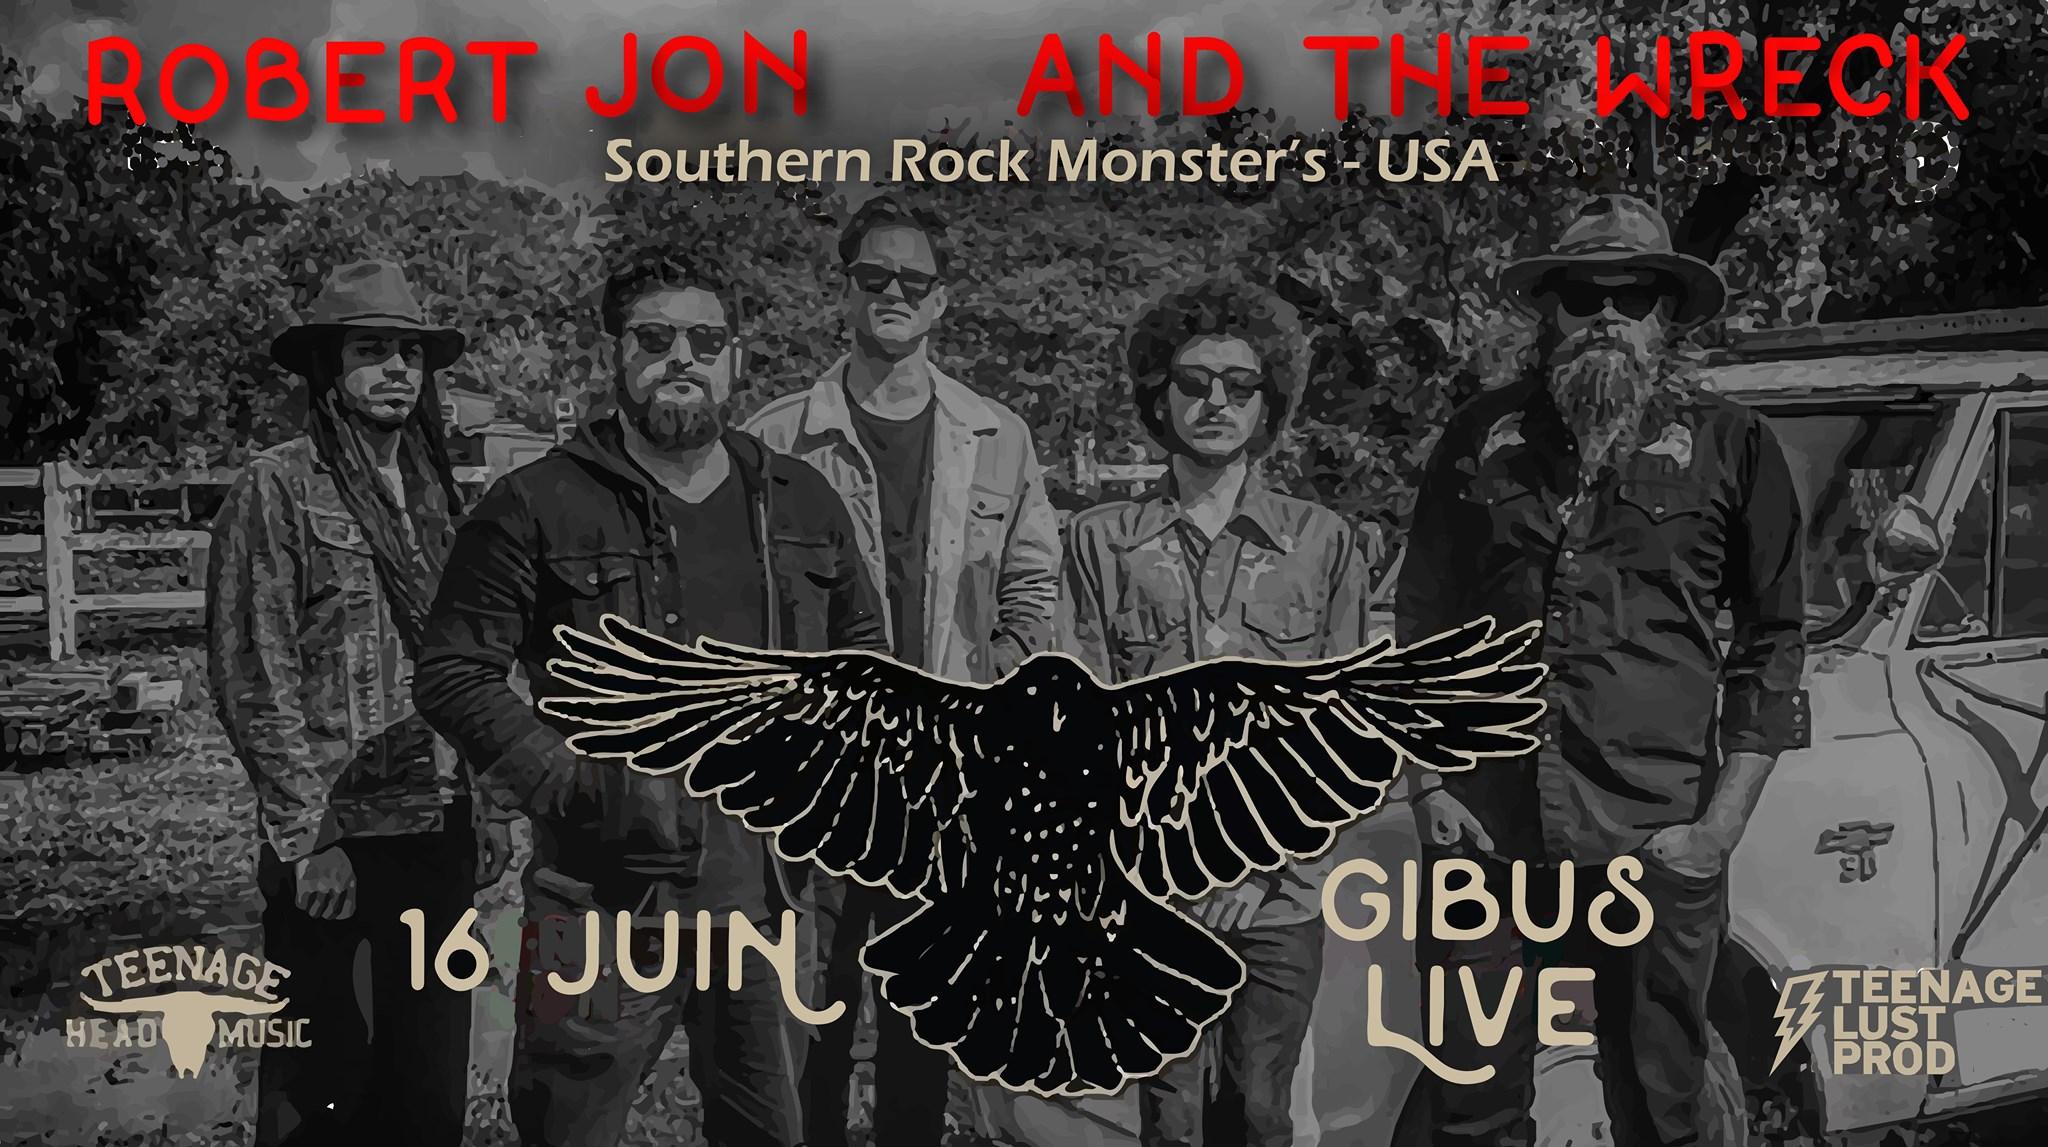 03.06.2019 – Robert Jon & The Wreck (southern rock, US)•Thomas Schoeffler Jr.